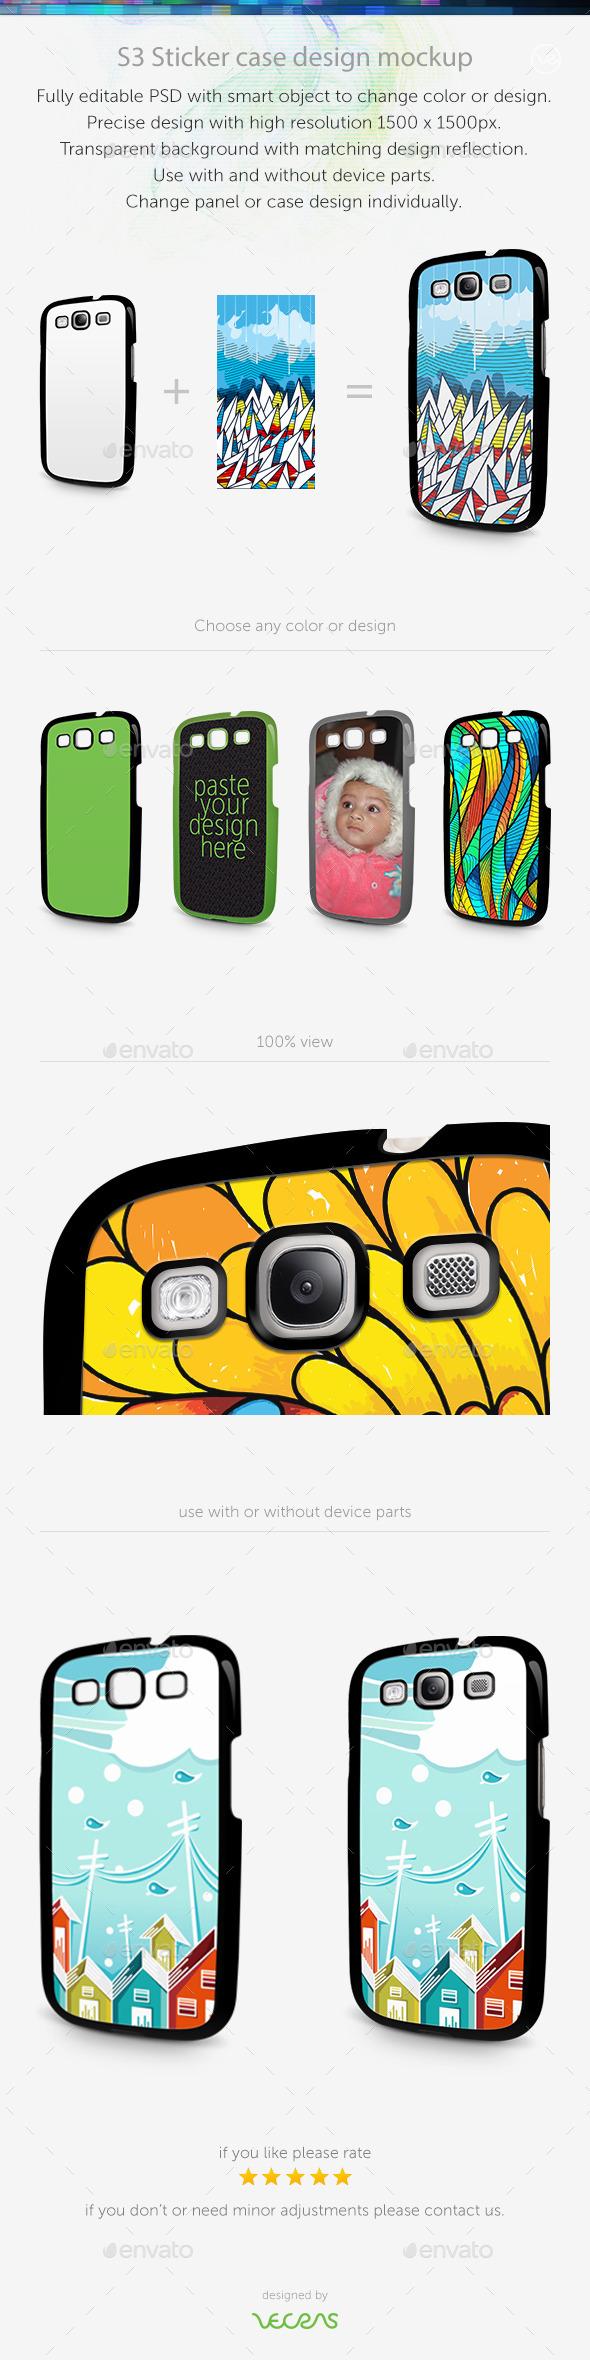 S3 Sticker Case Design Mockup